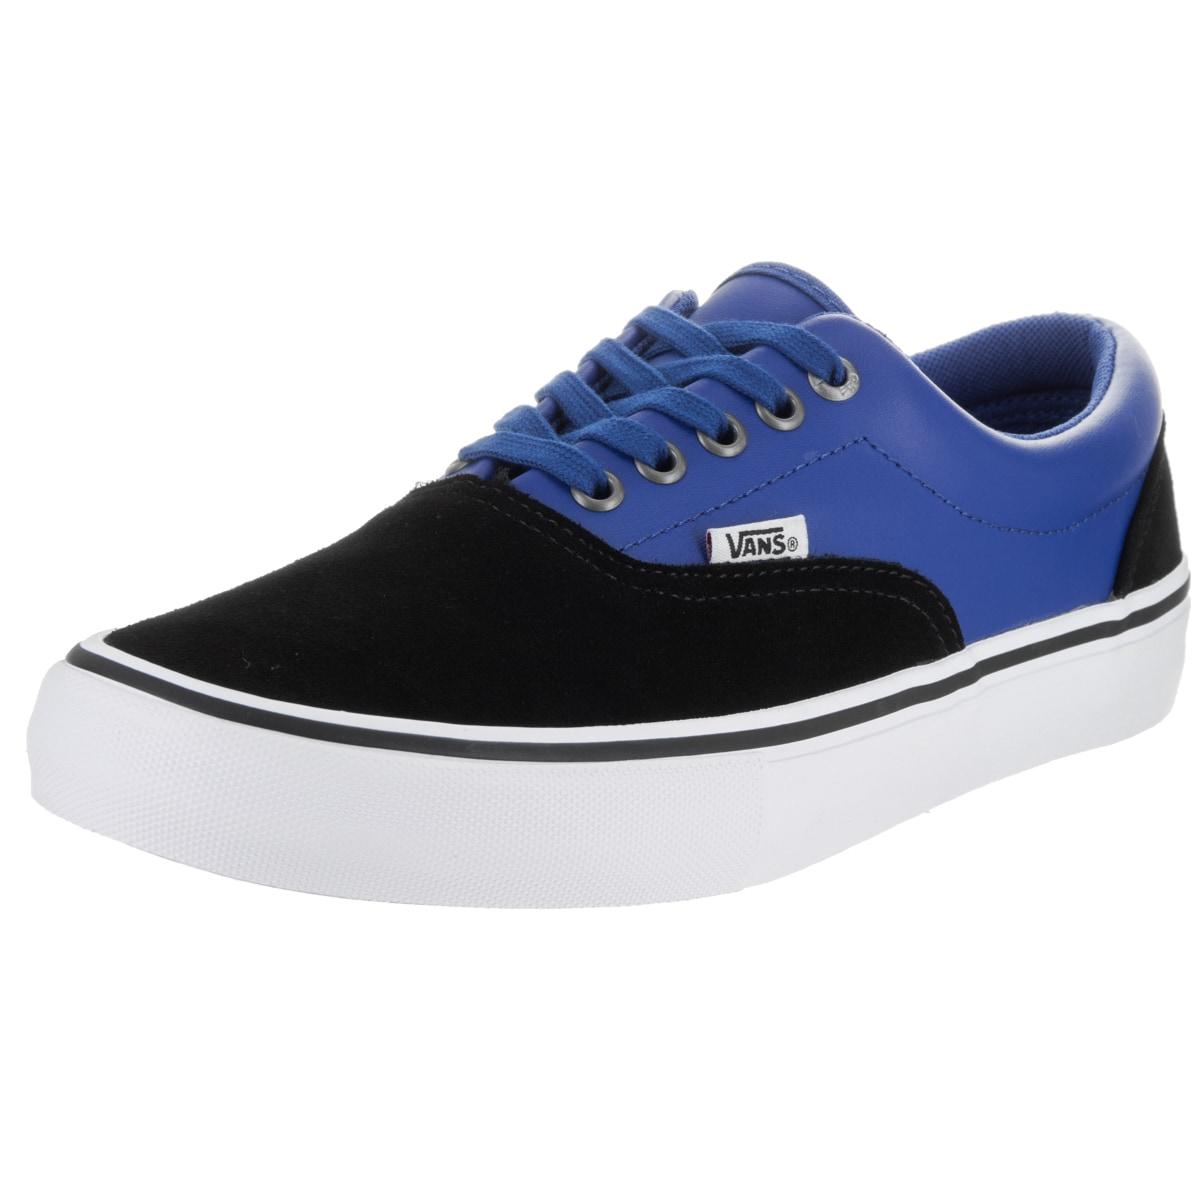 c8d165d55e Shop Vans Men s Era Pro (Real Skateboards) Skate Shoes - Free ...